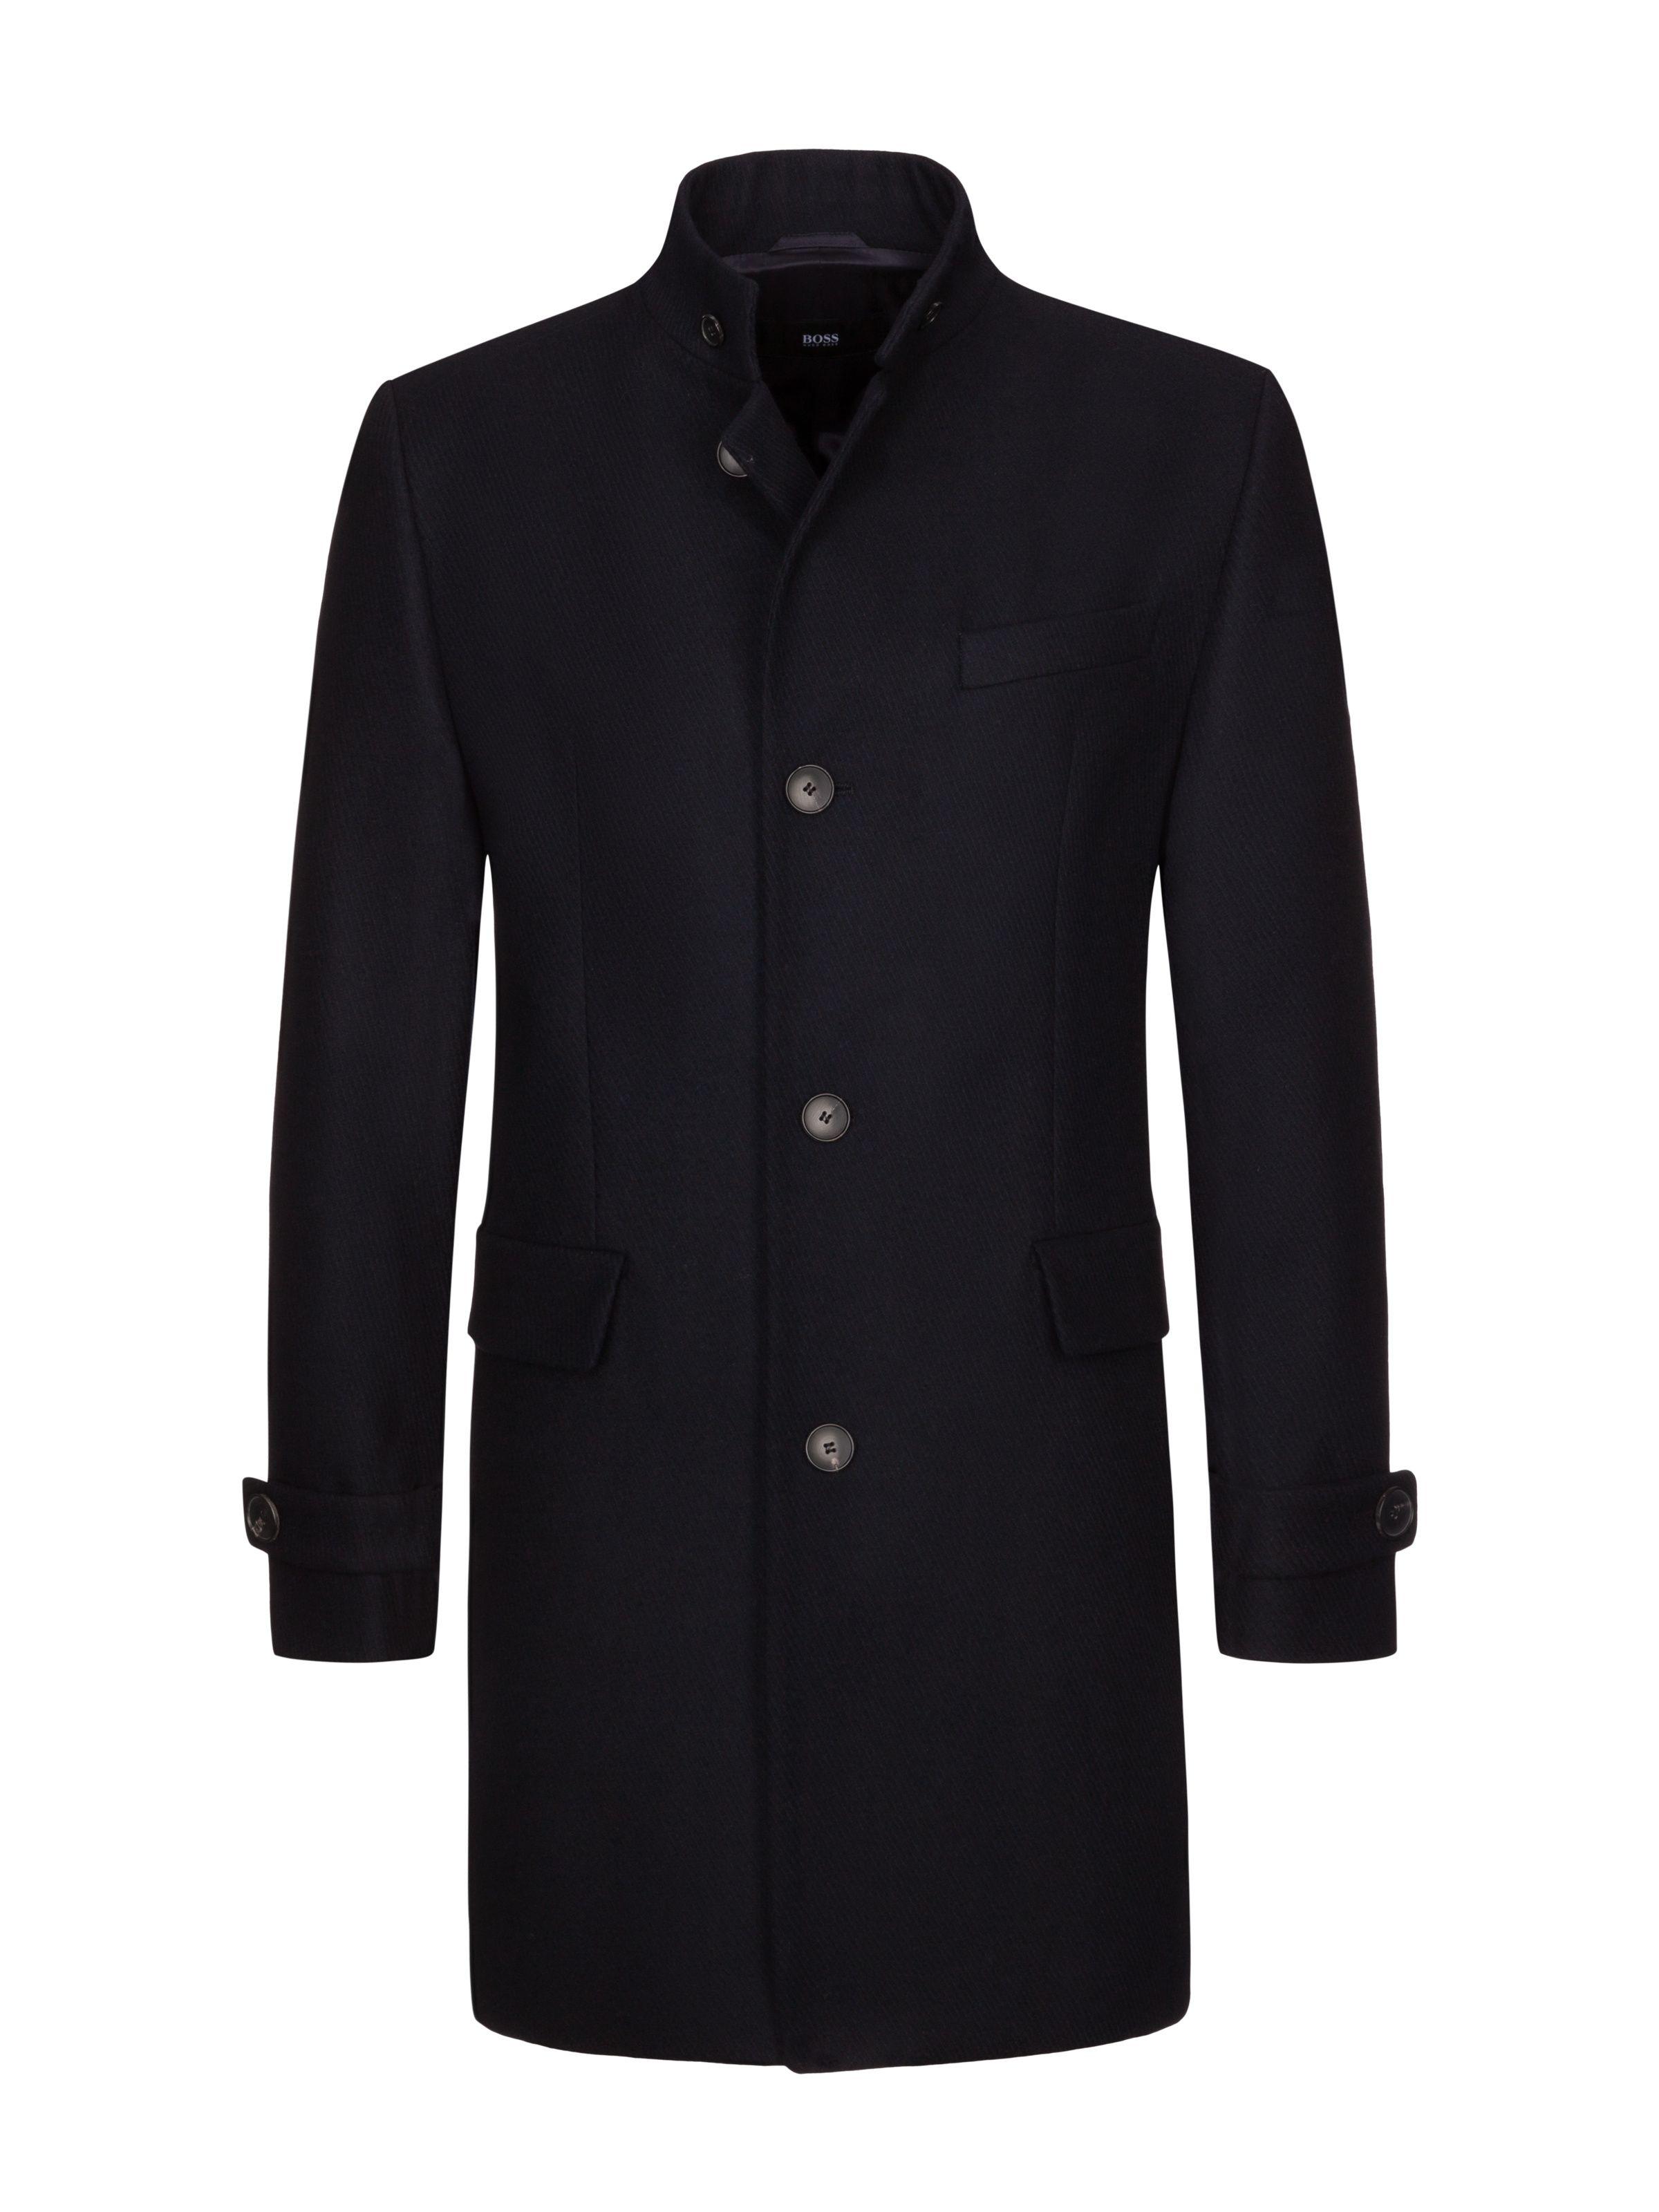 Boss Businessmantel Mit Stehkragen Marine Hirmer Herrenmode Sale Hirmer Munchen Mensfashion Mensstyle Fashio Mens Jackets Casual Boss Outfit Mens Coats